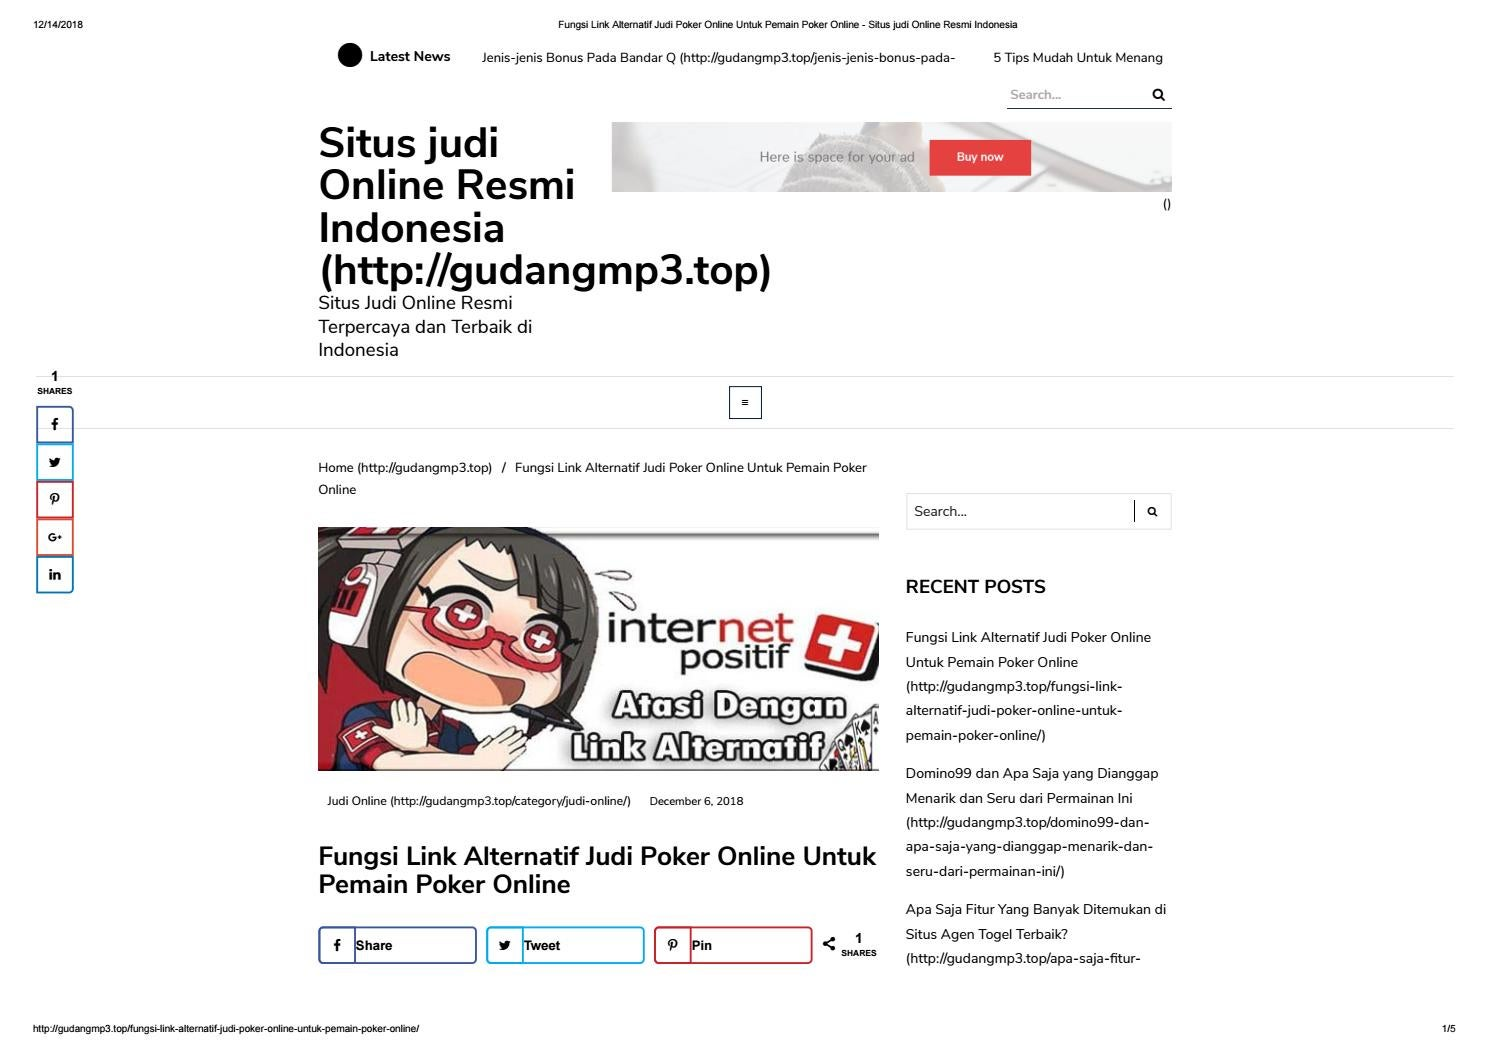 Fungsi Link Alternatif Judi Poker Online Untuk Pemain Poker Online By Wsd88qq Official Issuu